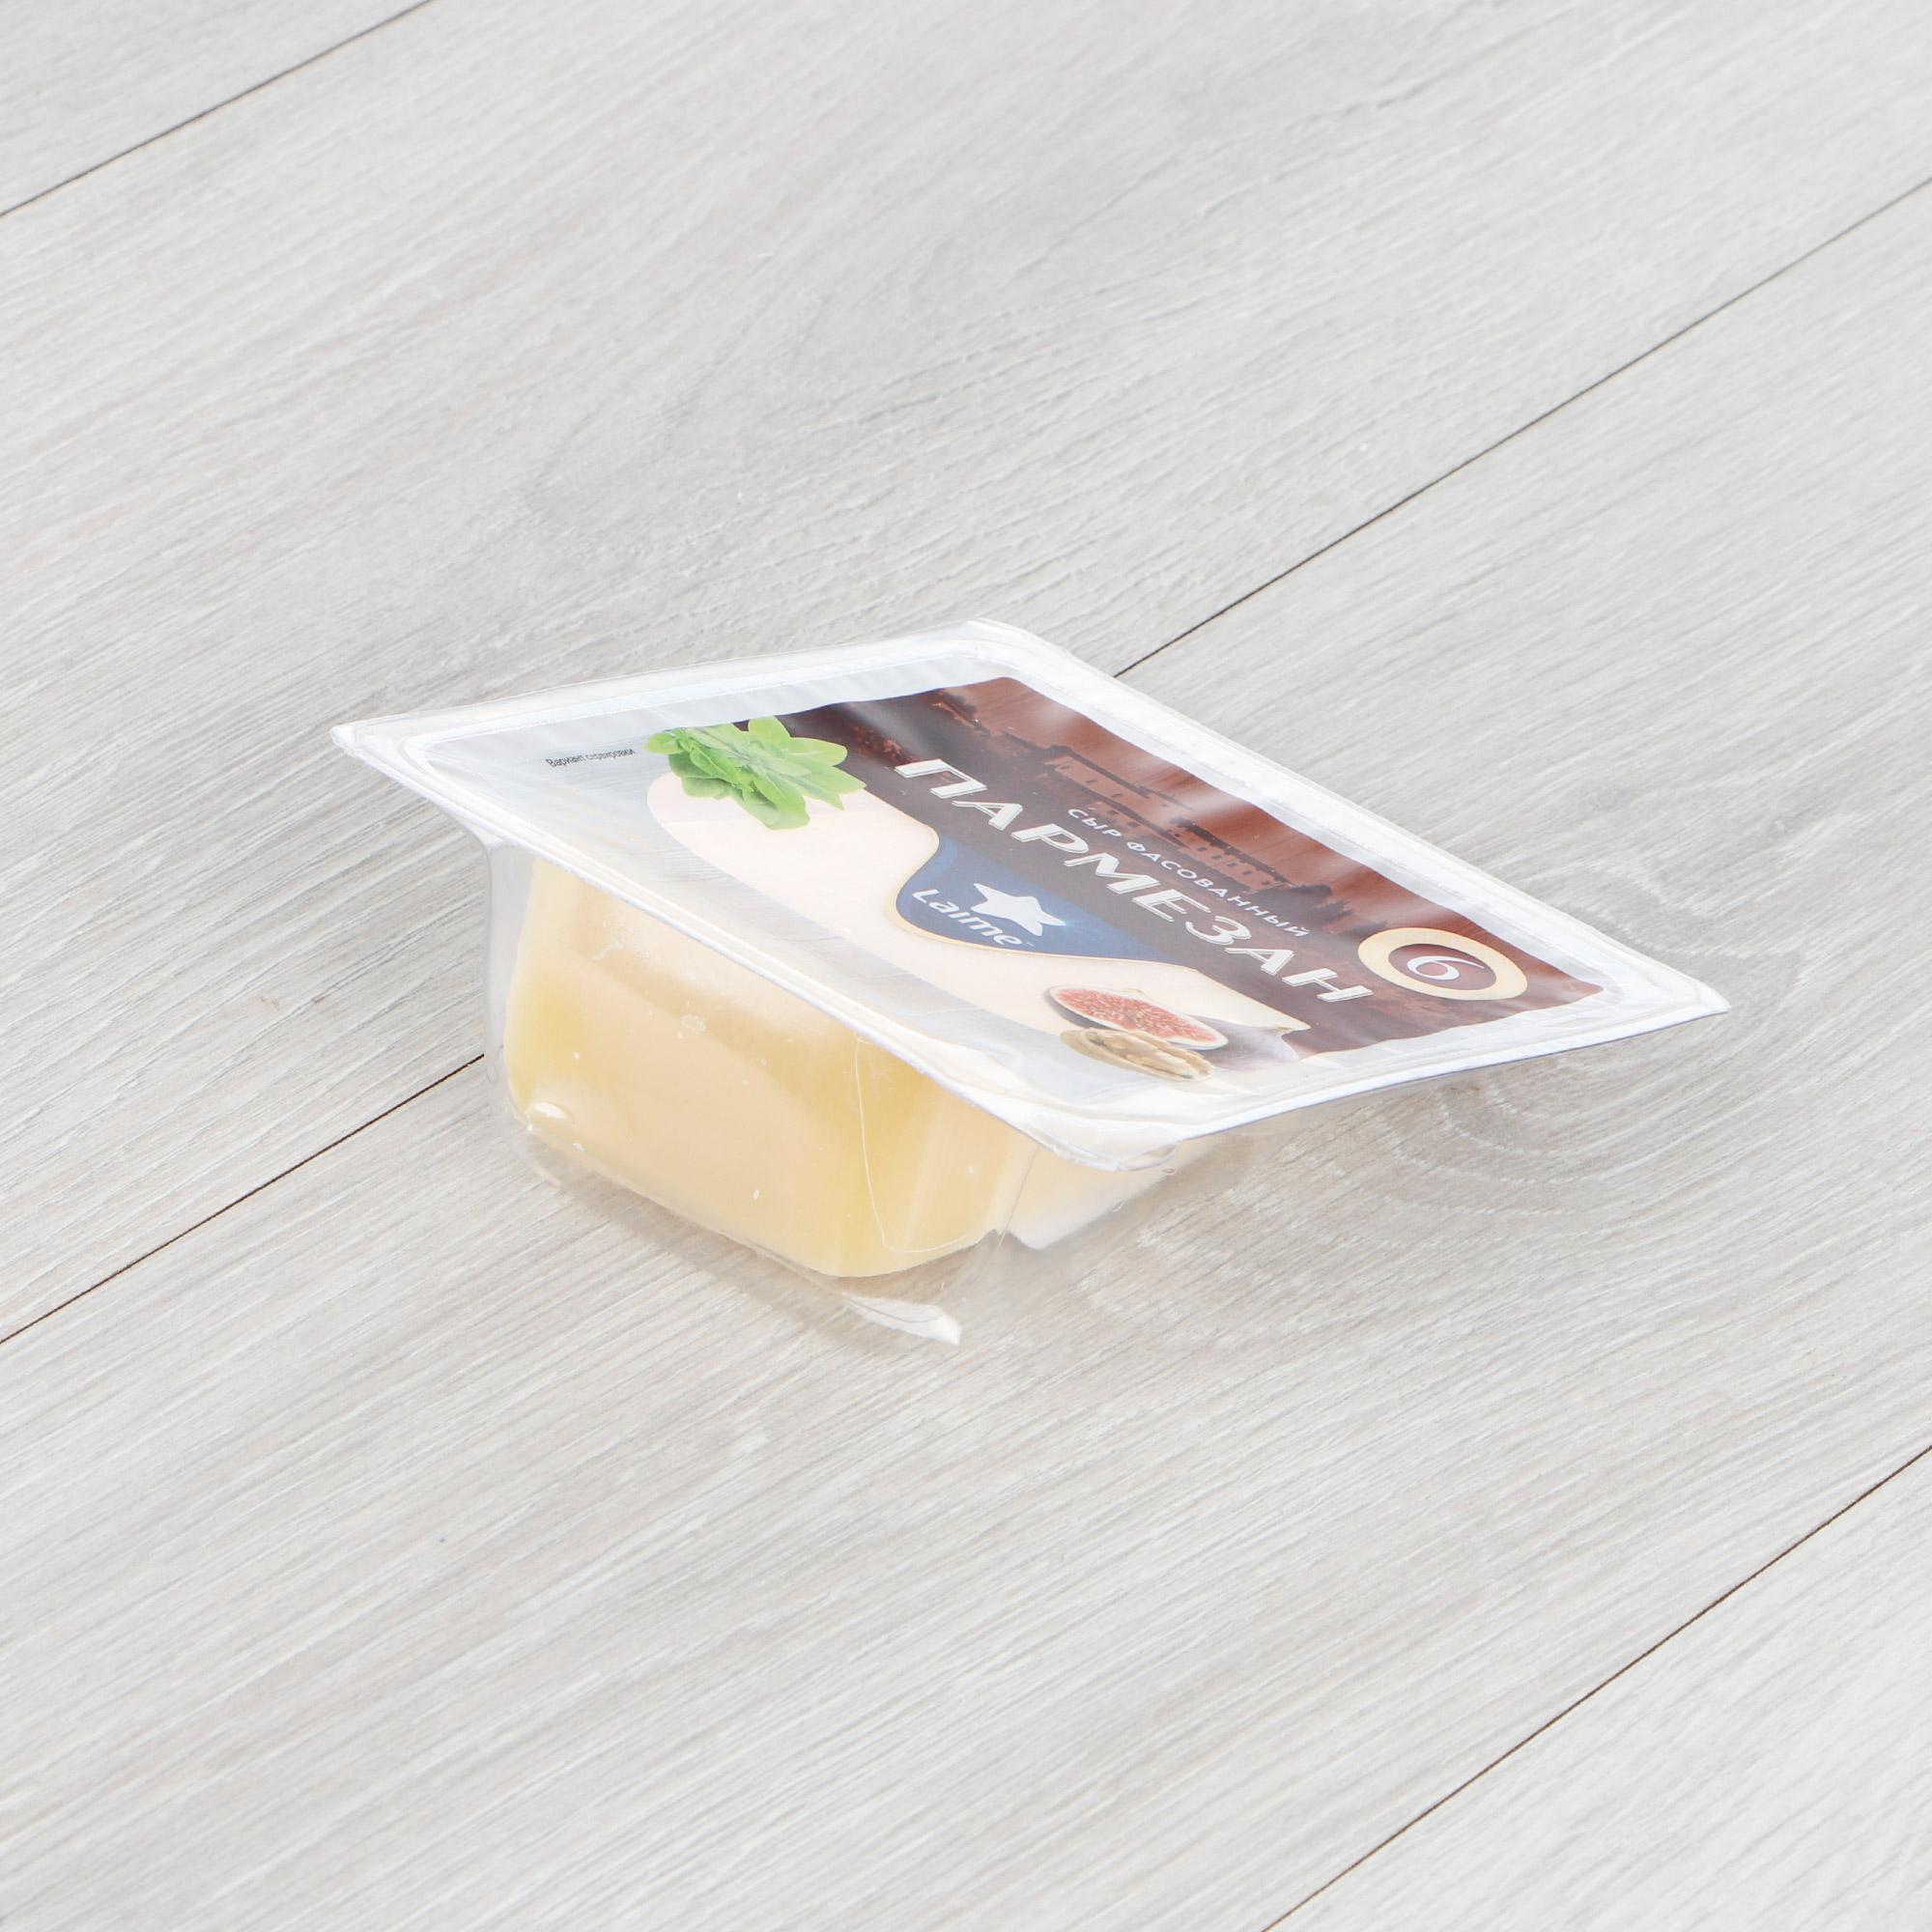 Фото - Сыр Laime Пармезан 40% 175 г без брэнда бзмж сыр твердый пармезан 40% laime